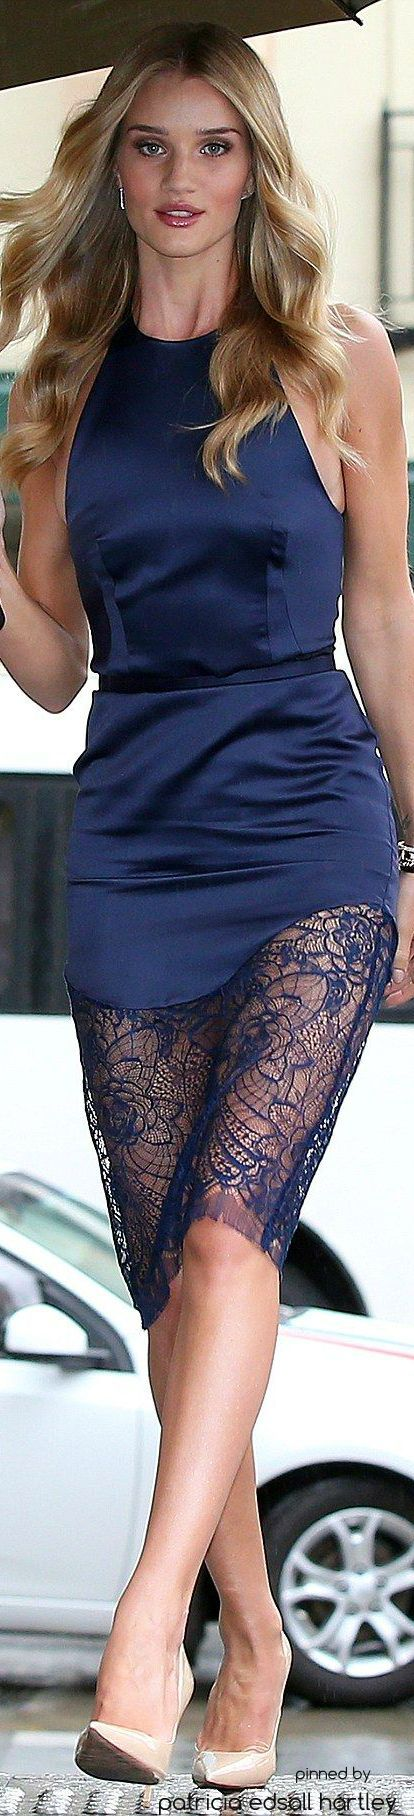 Rosie huntington transformers 3 vestido azul 3d